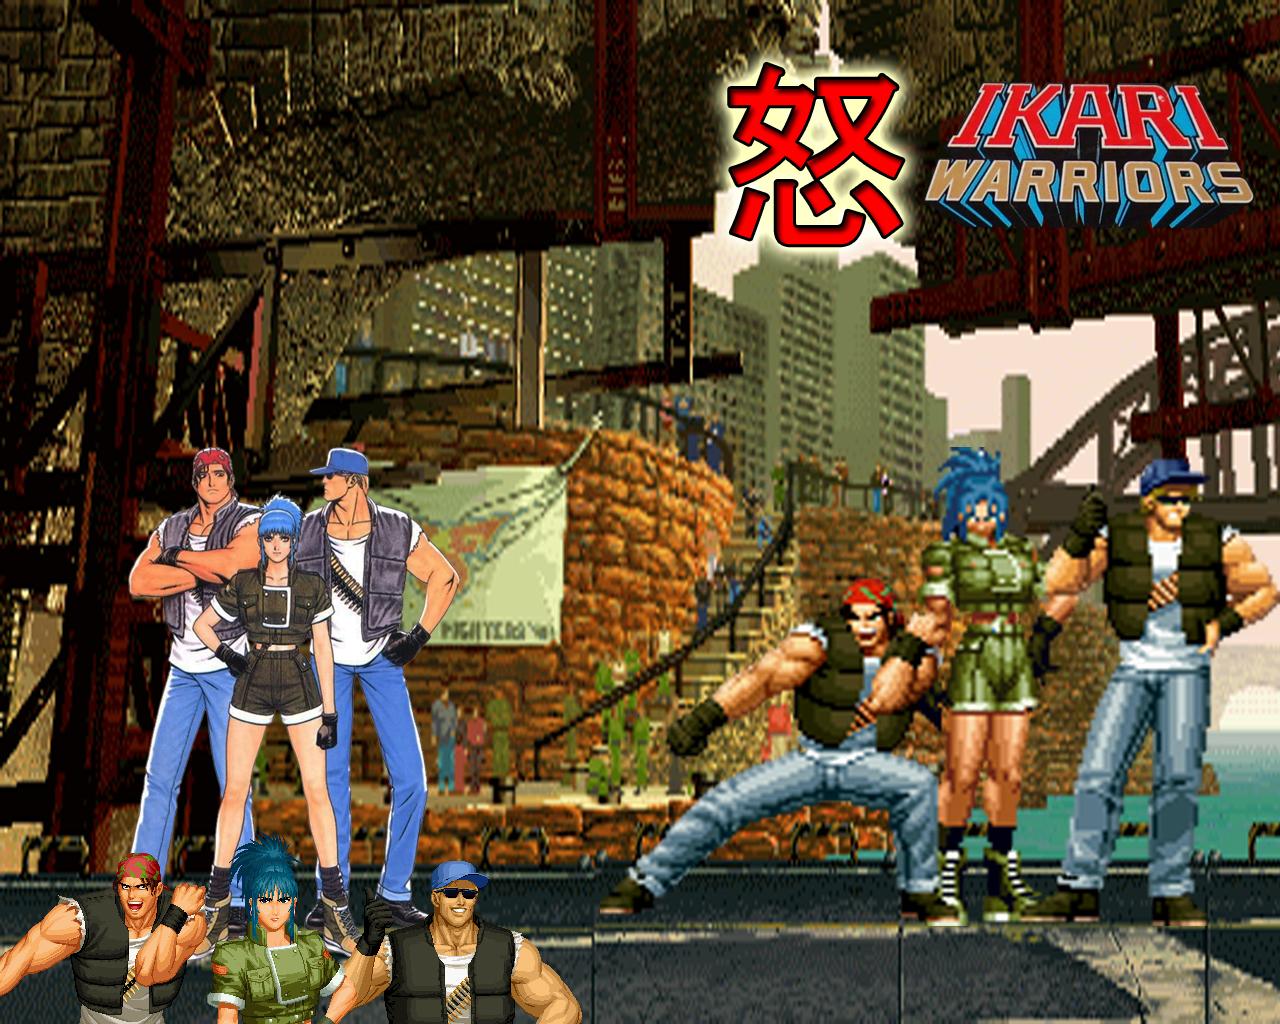 Ikari Warriors High Quality Background on Wallpapers Vista